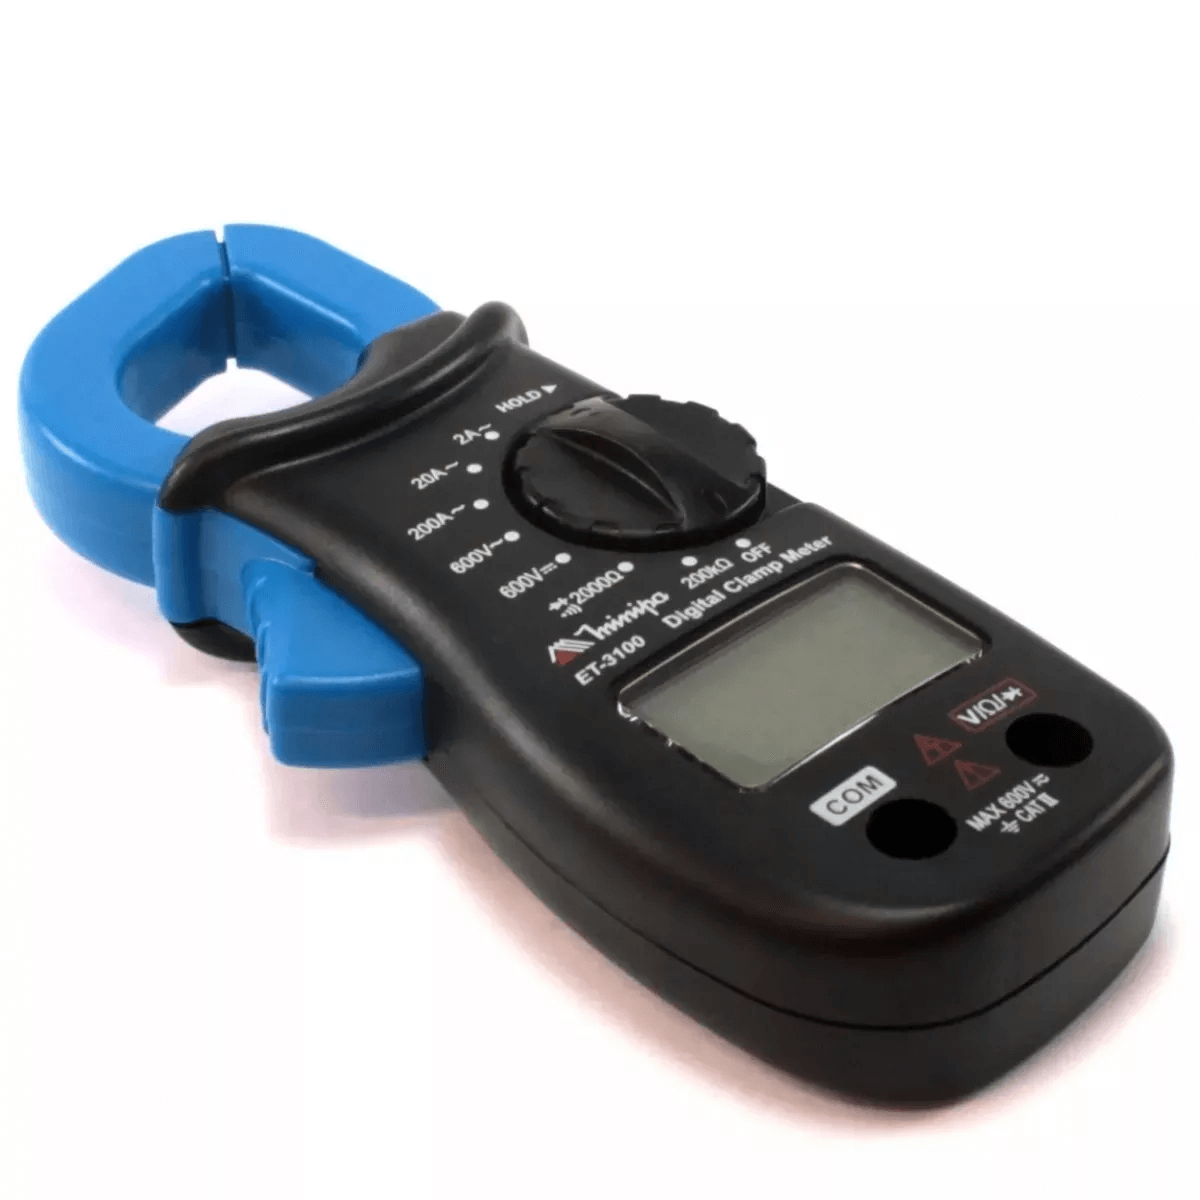 Kit Alicate Amp Et-3100 + Detector Tensão Ez Alert Ii Minipa